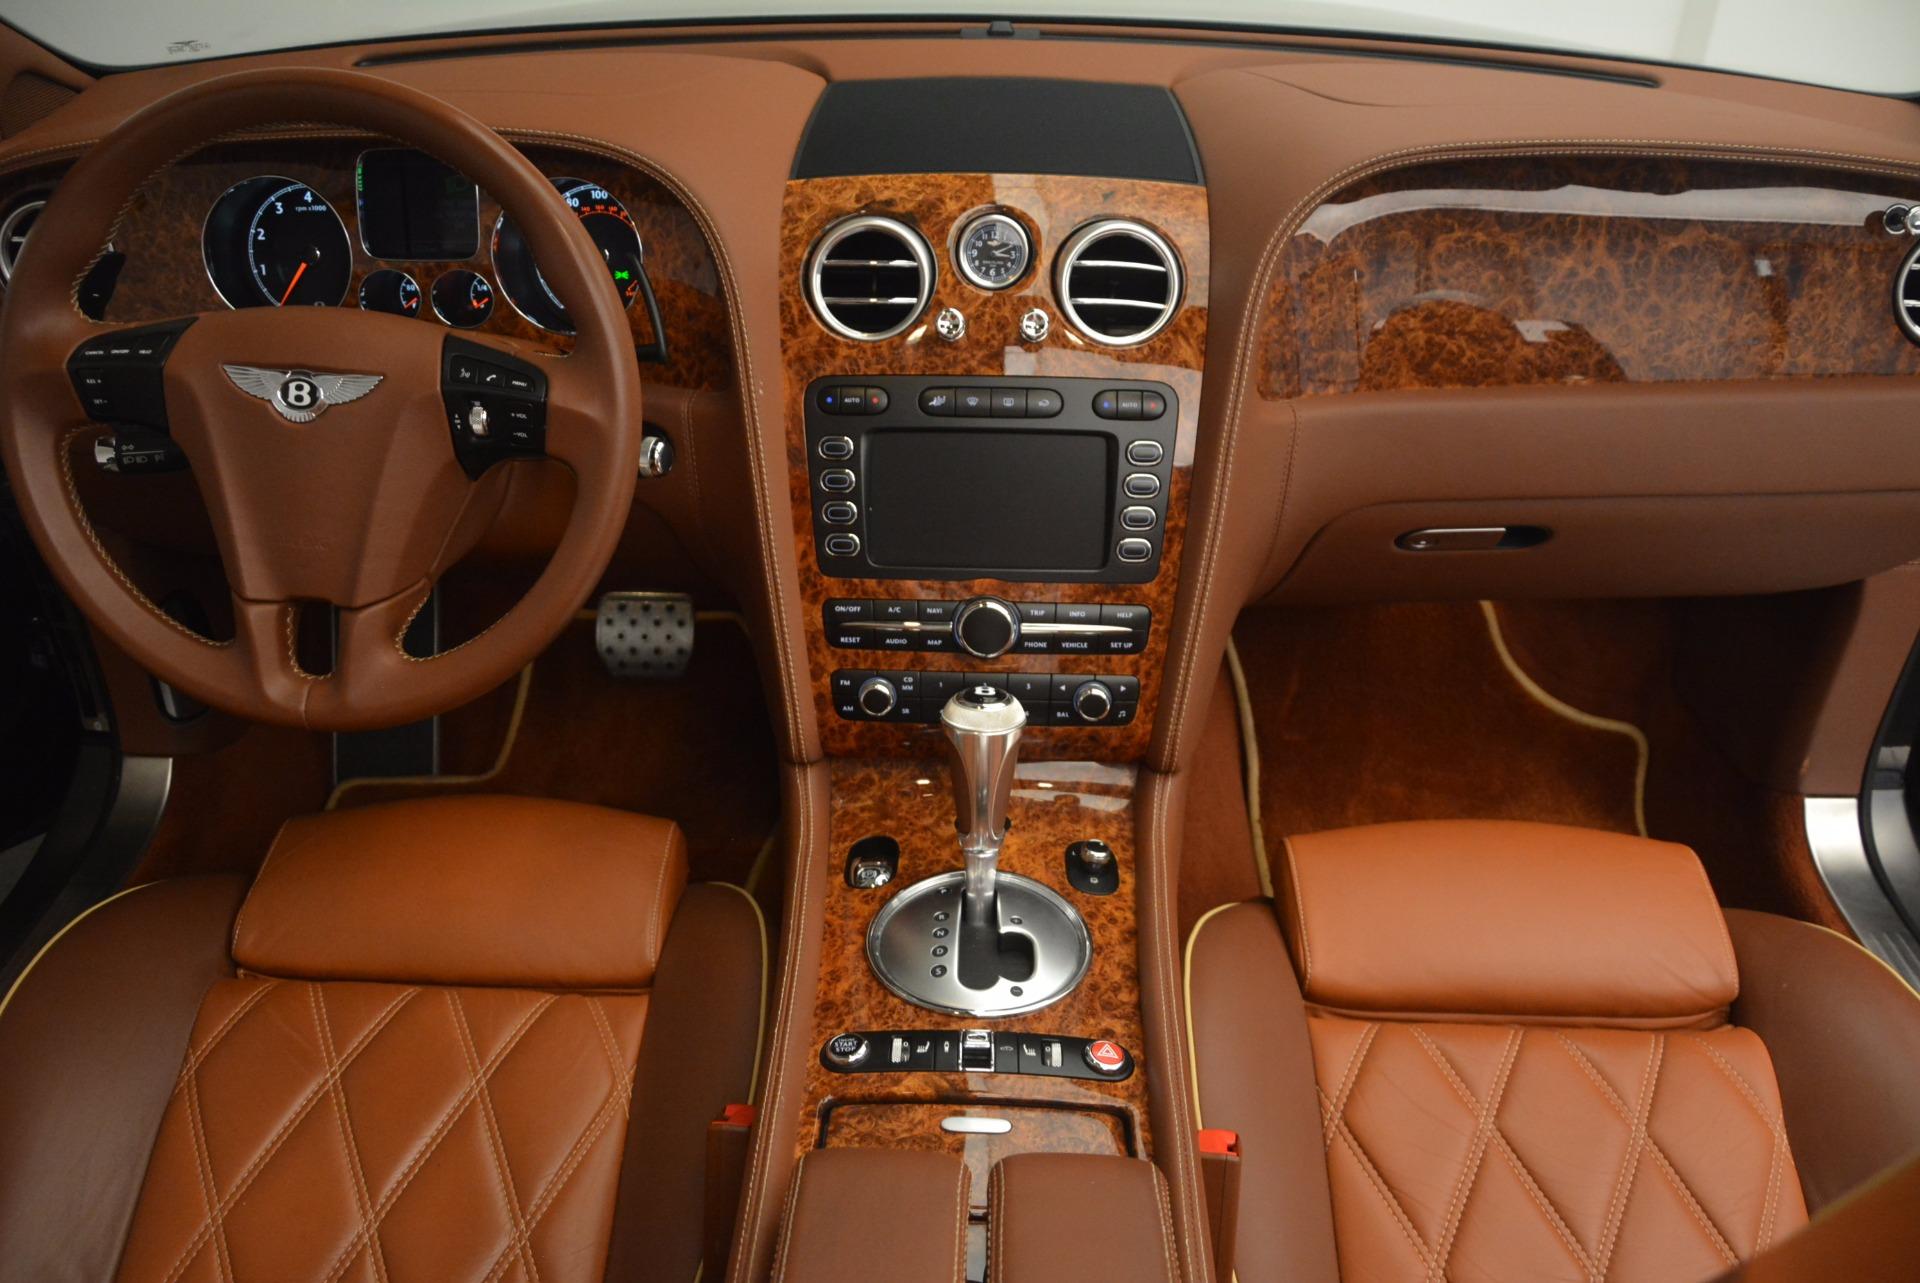 Used 2010 Bentley Continental GT Series 51 For Sale In Westport, CT 1222_p45